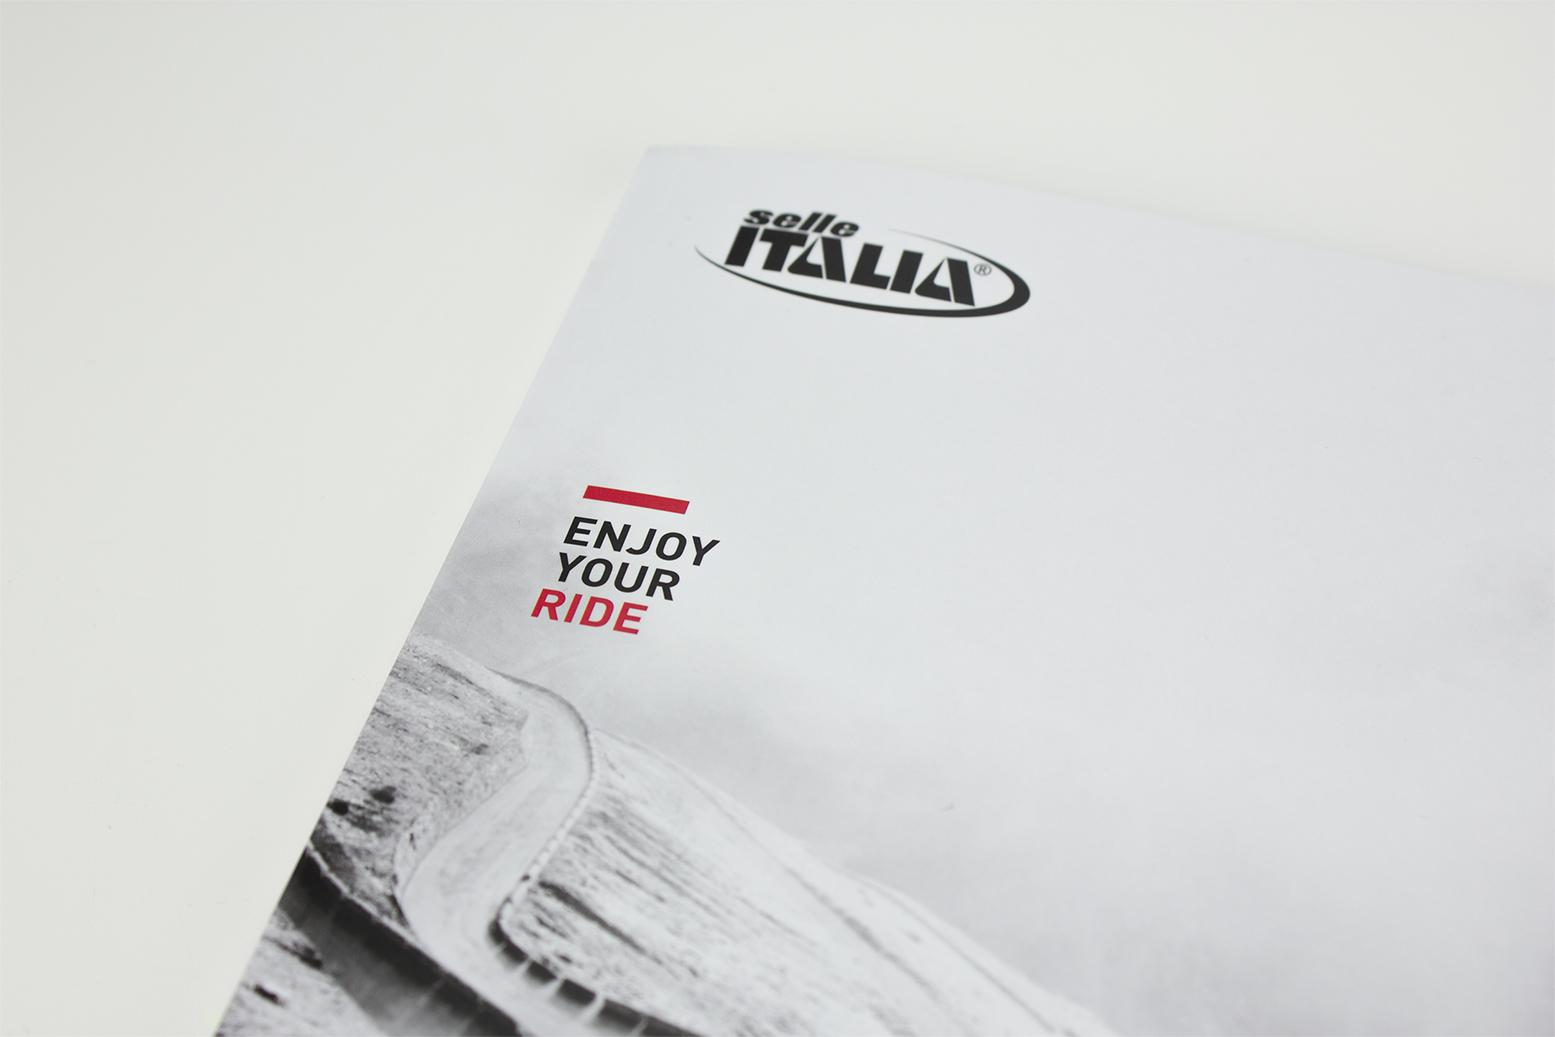 SelleItalia-enjoyouride-logo4.jpg